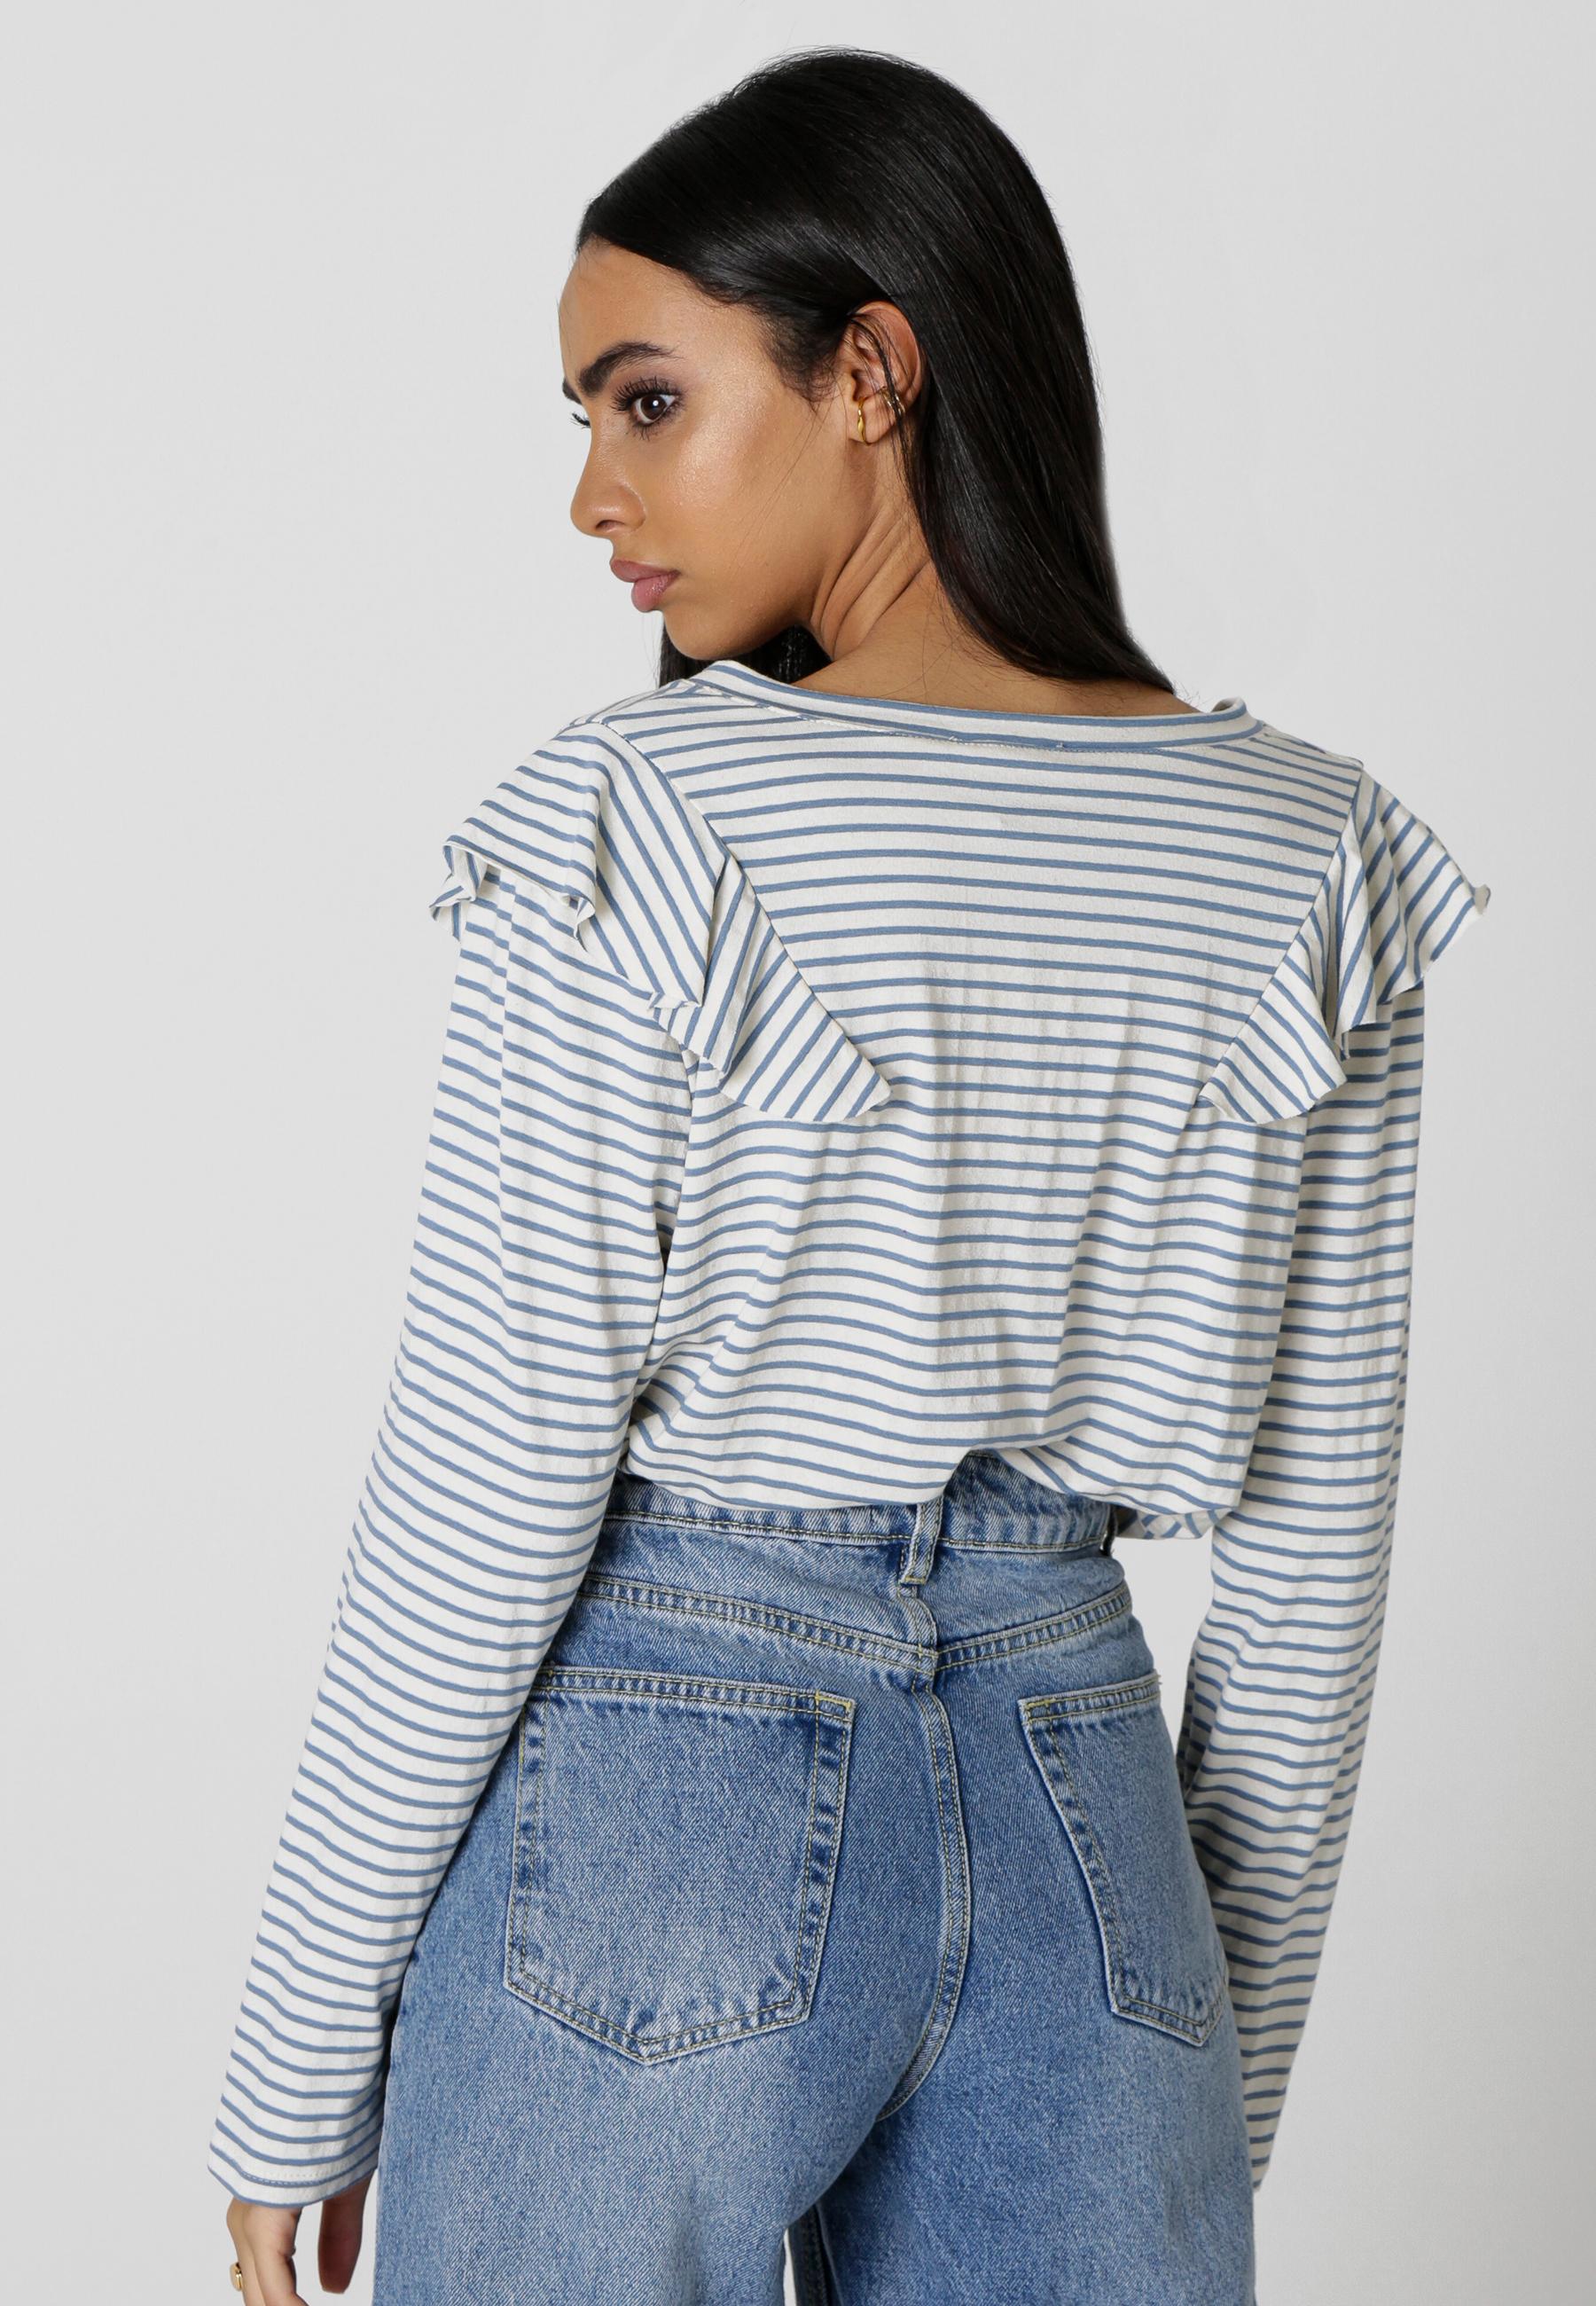 MiaZAYA Shirt Livia